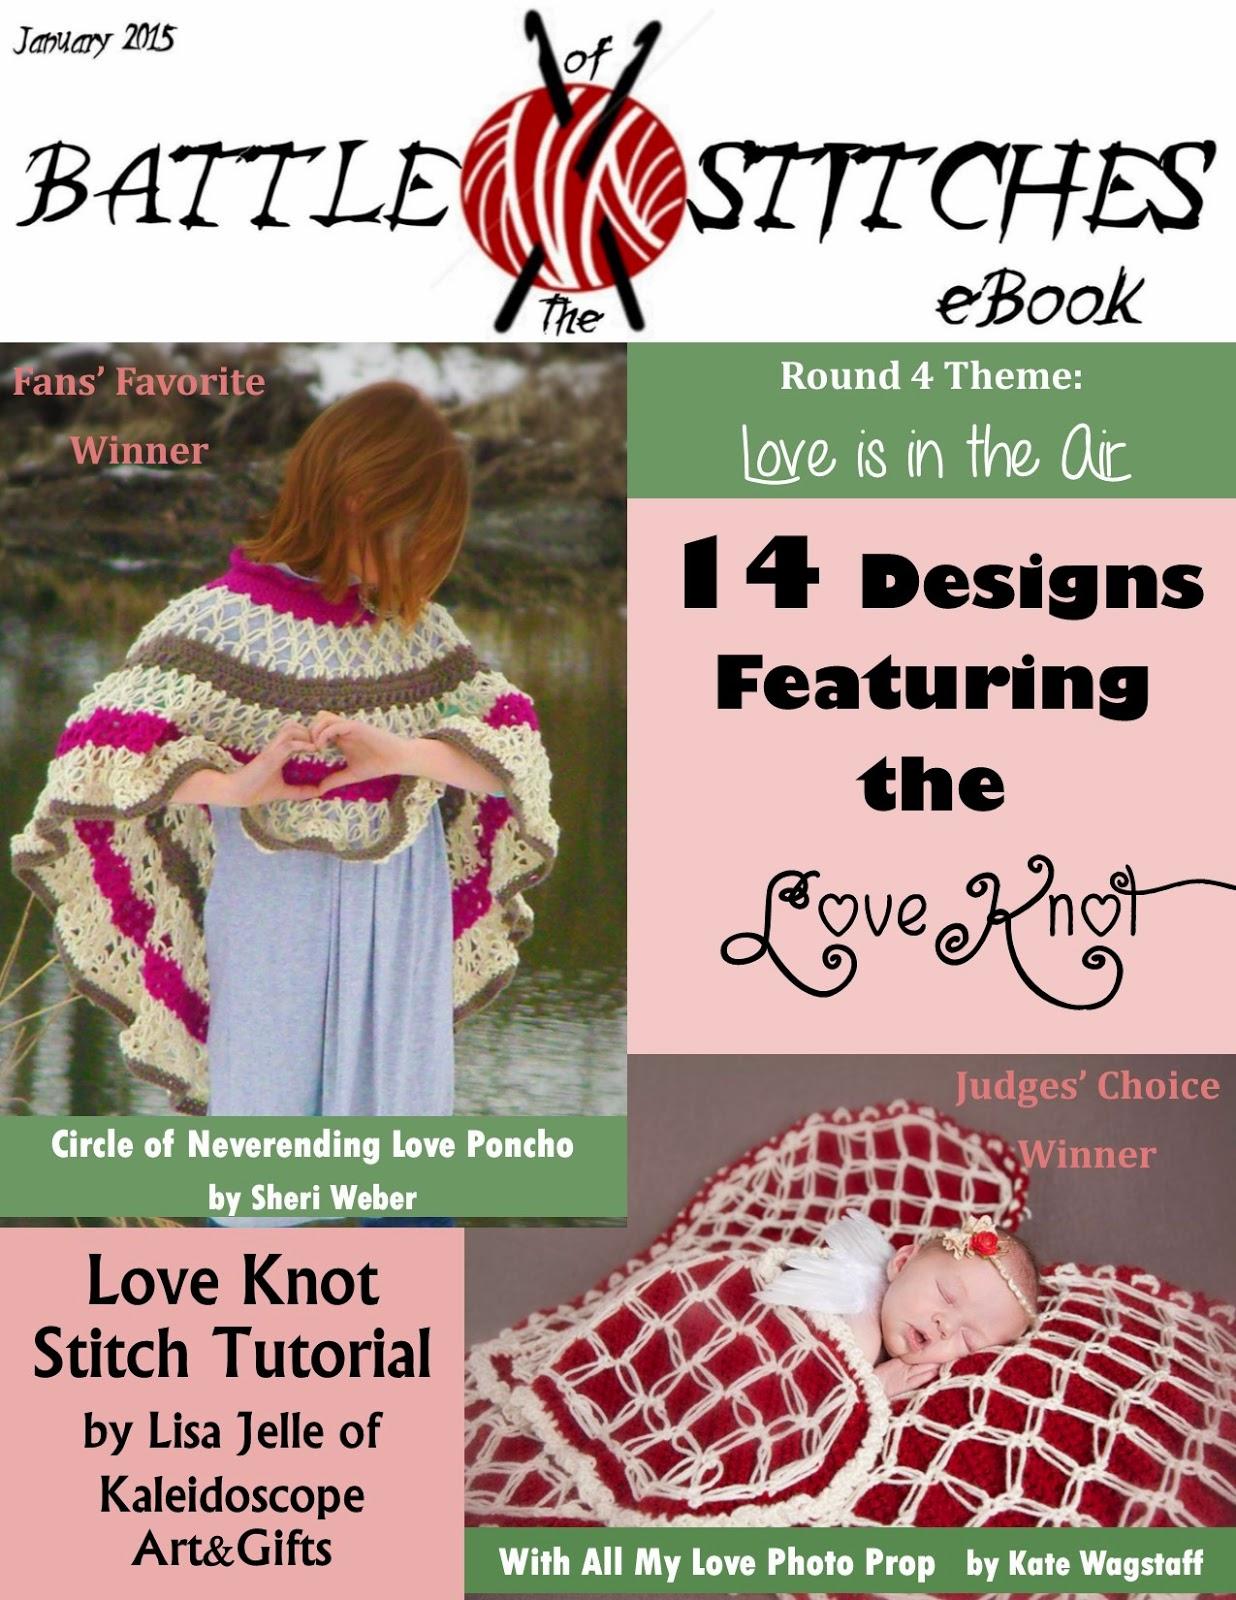 Battle of the Stitches Round 4 eBook